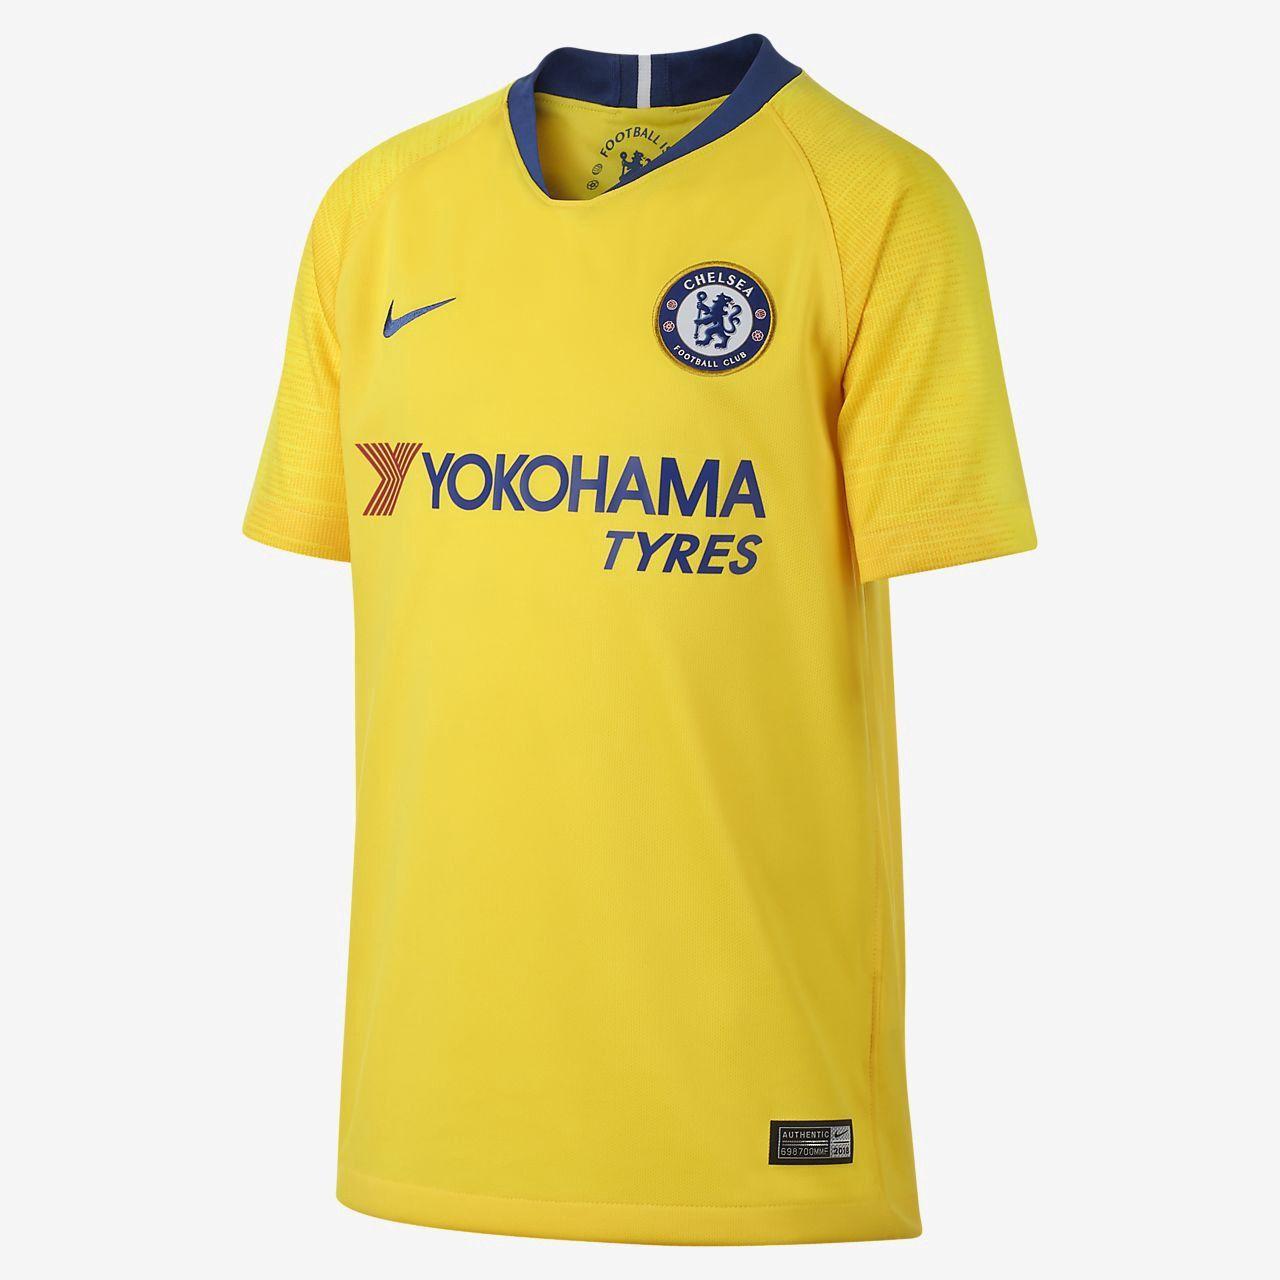 Nike 2018 19 Chelsea Fc Stadium Away Big Kids  Soccer Jersey - M (10-12)  Blue 98d6ddcdd